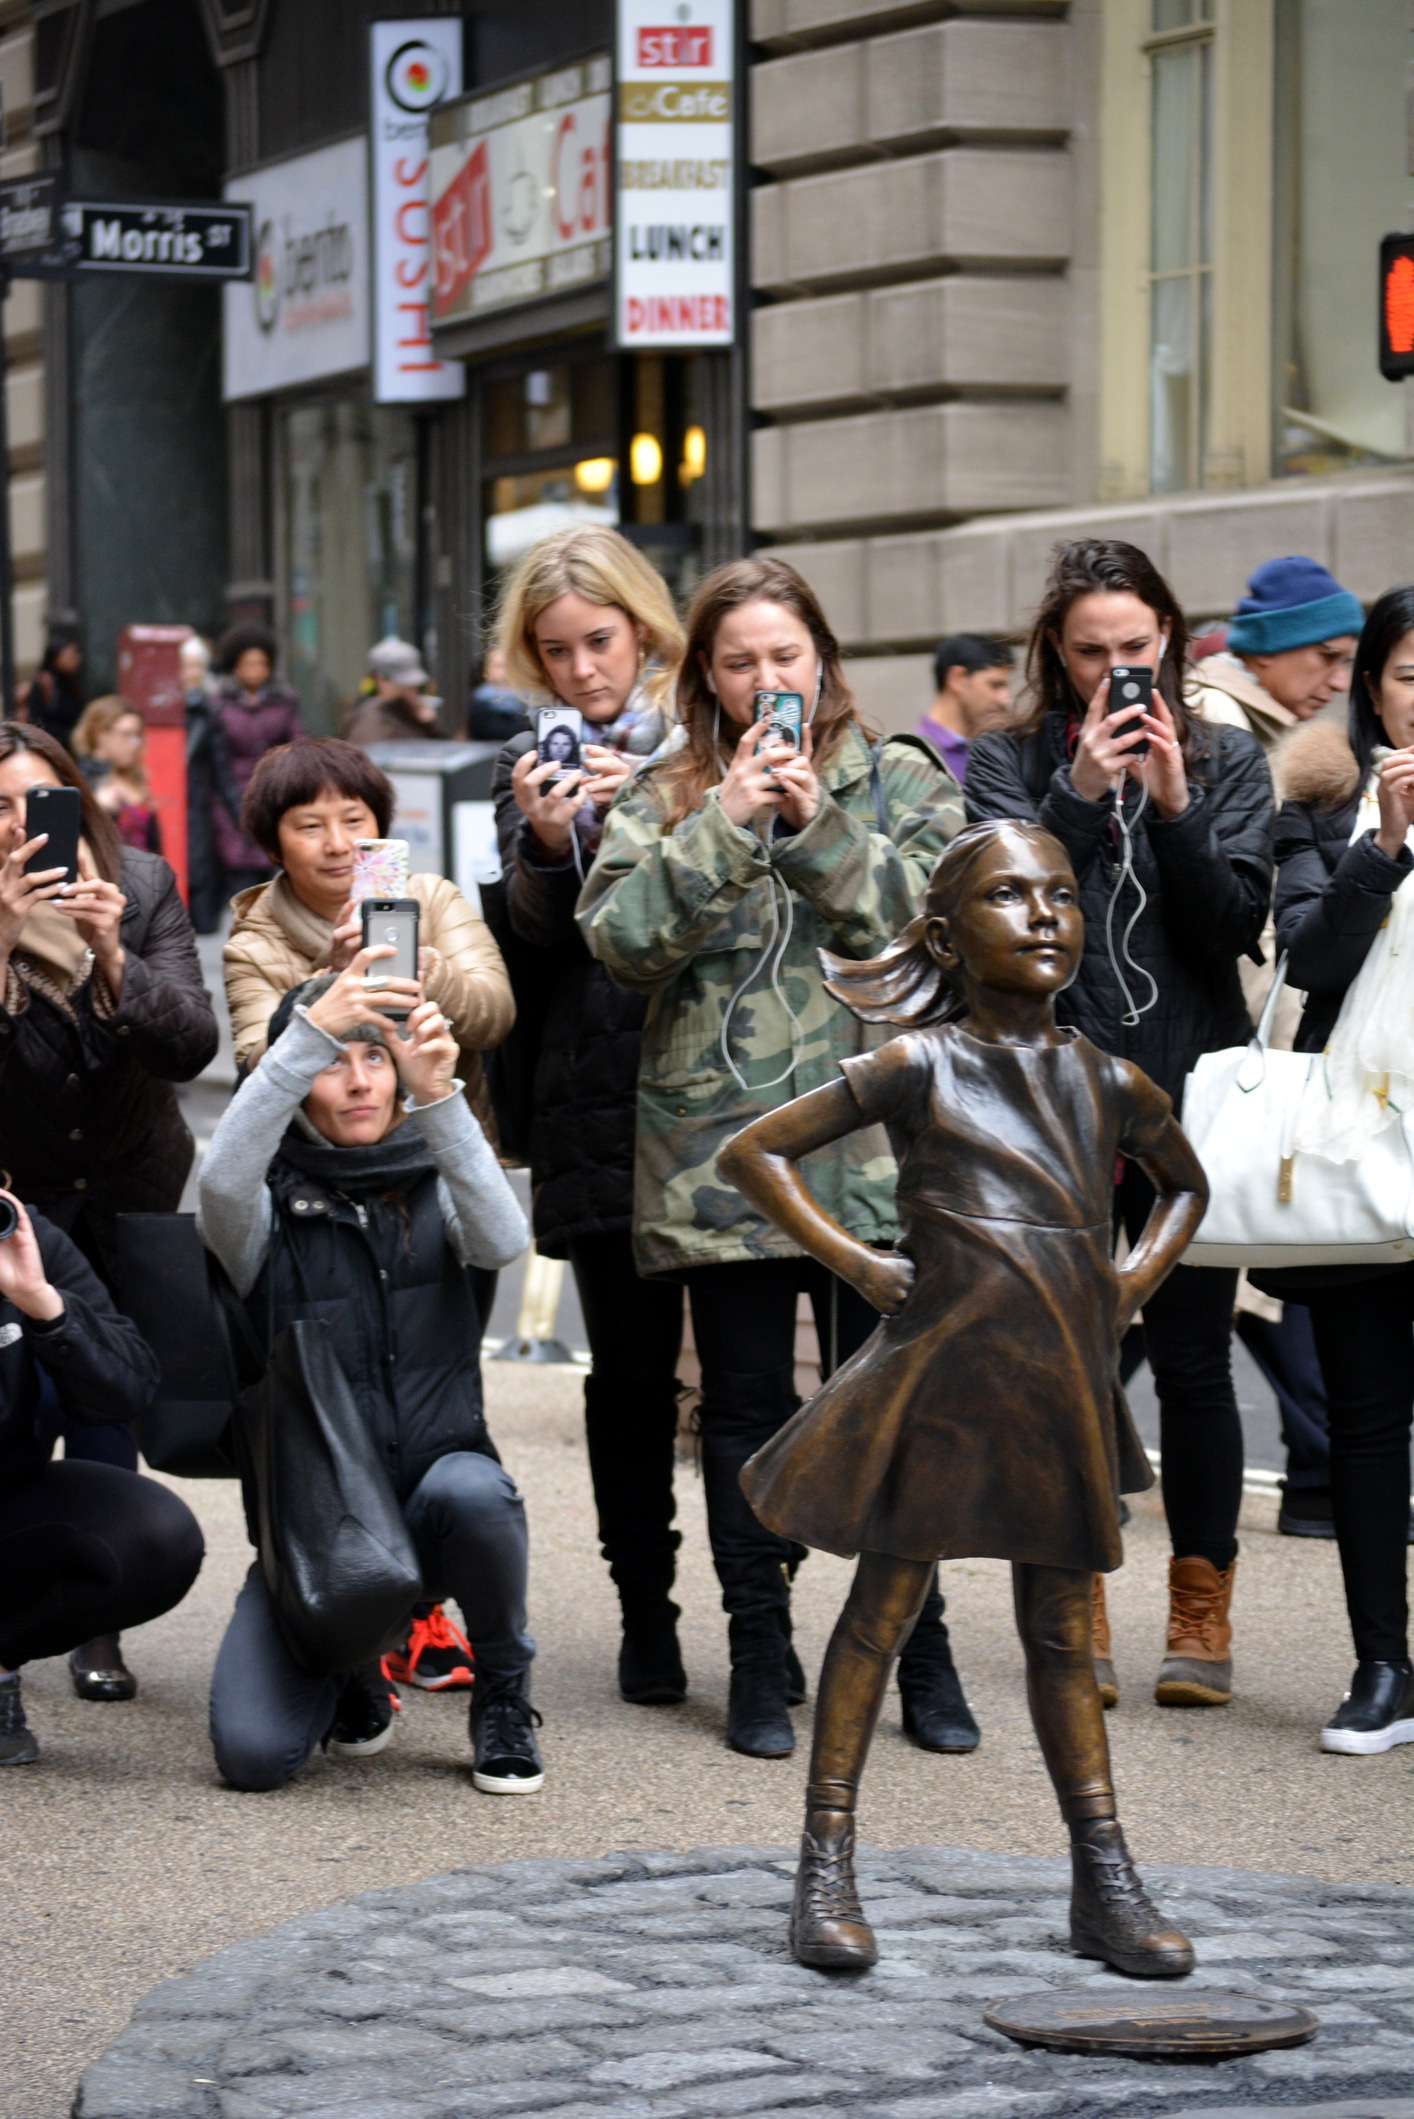 iStock 649795922 Uma menina em Wall Street